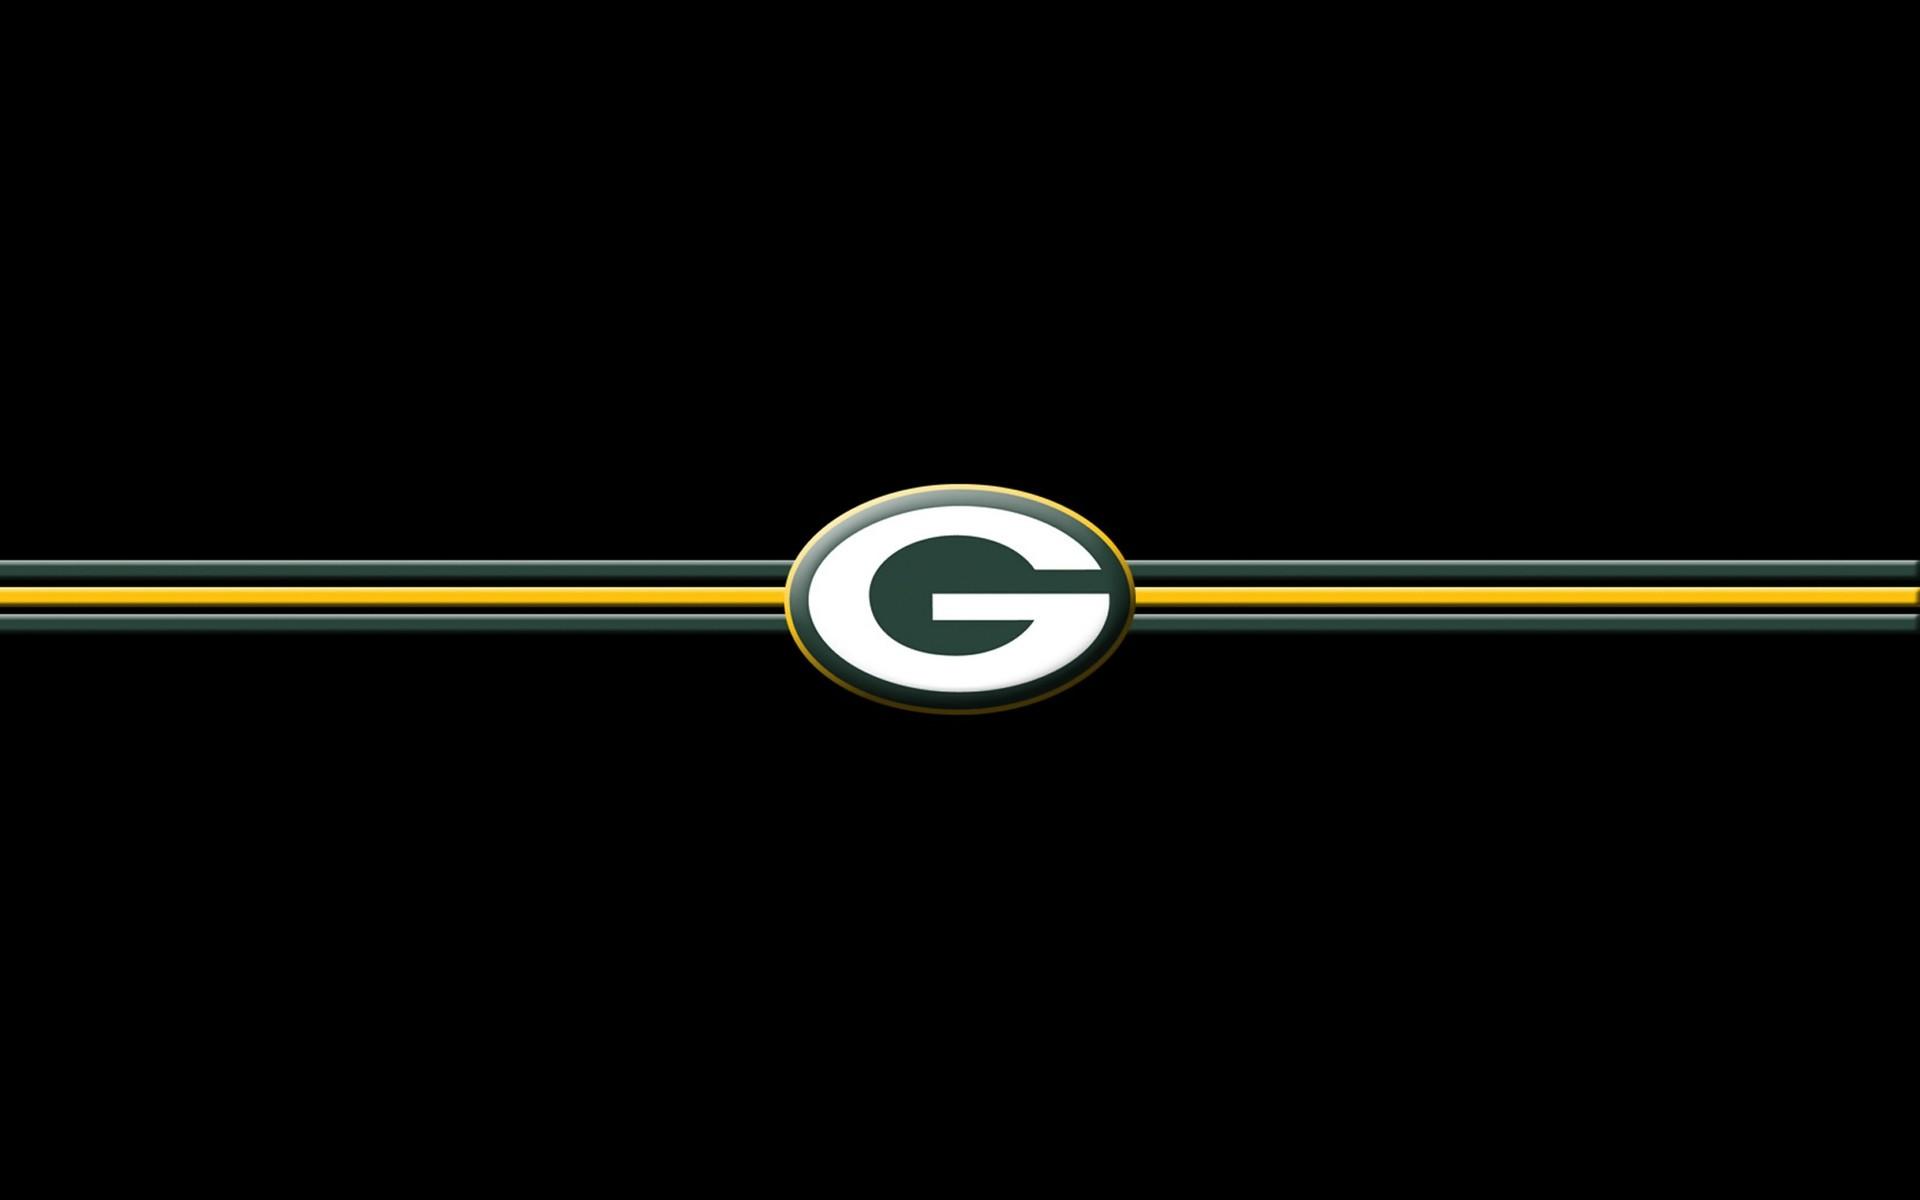 Dark Green Bay Packers Wallpaper 52898